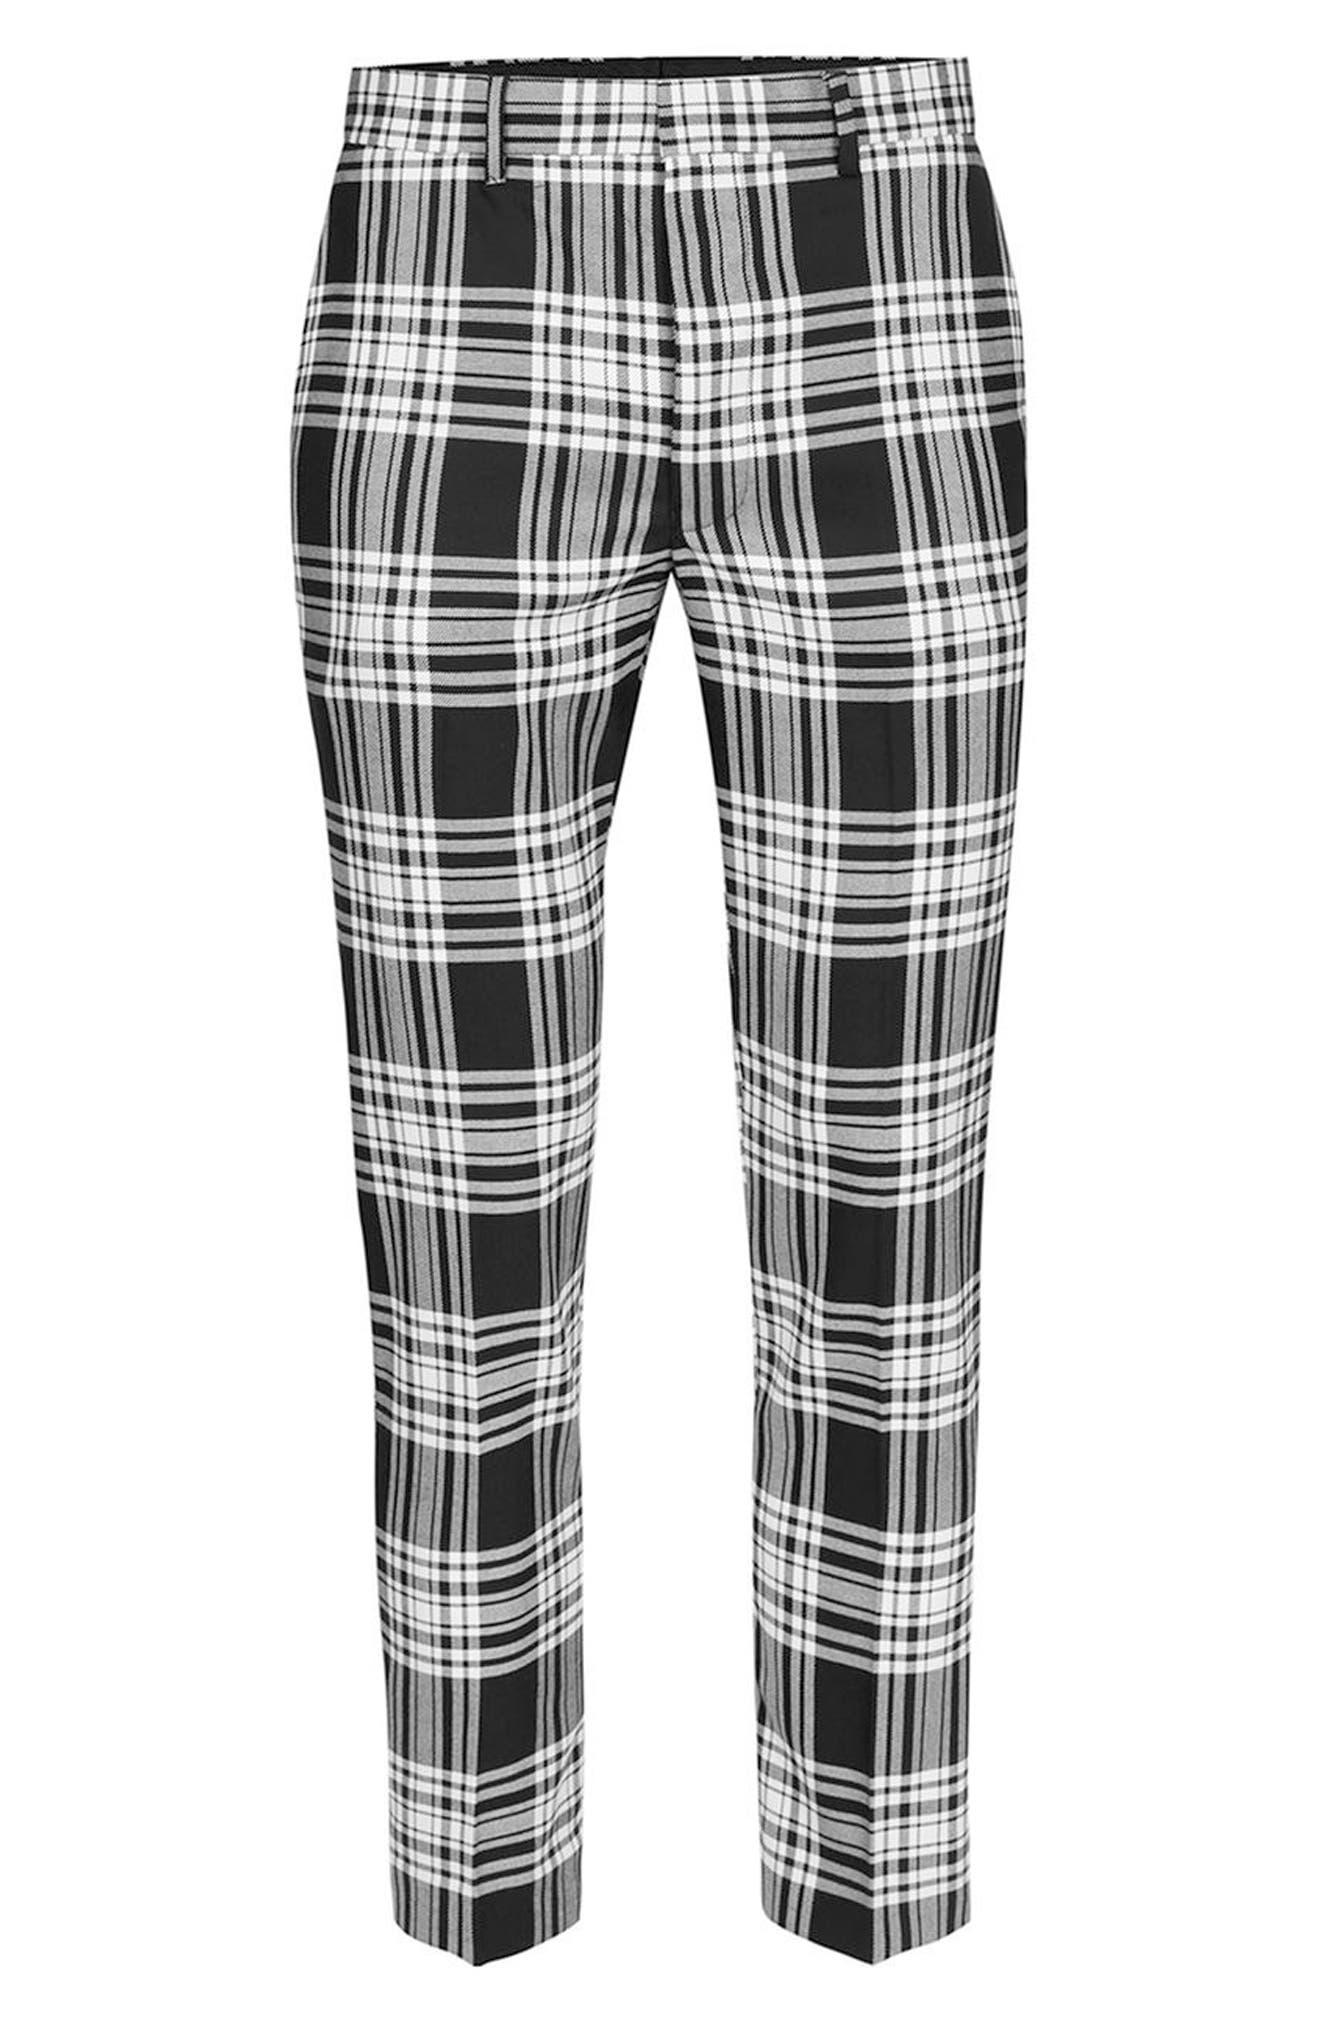 Plaid Ultra Skinny Fit Crop Trousers,                             Alternate thumbnail 5, color,                             Black Multi